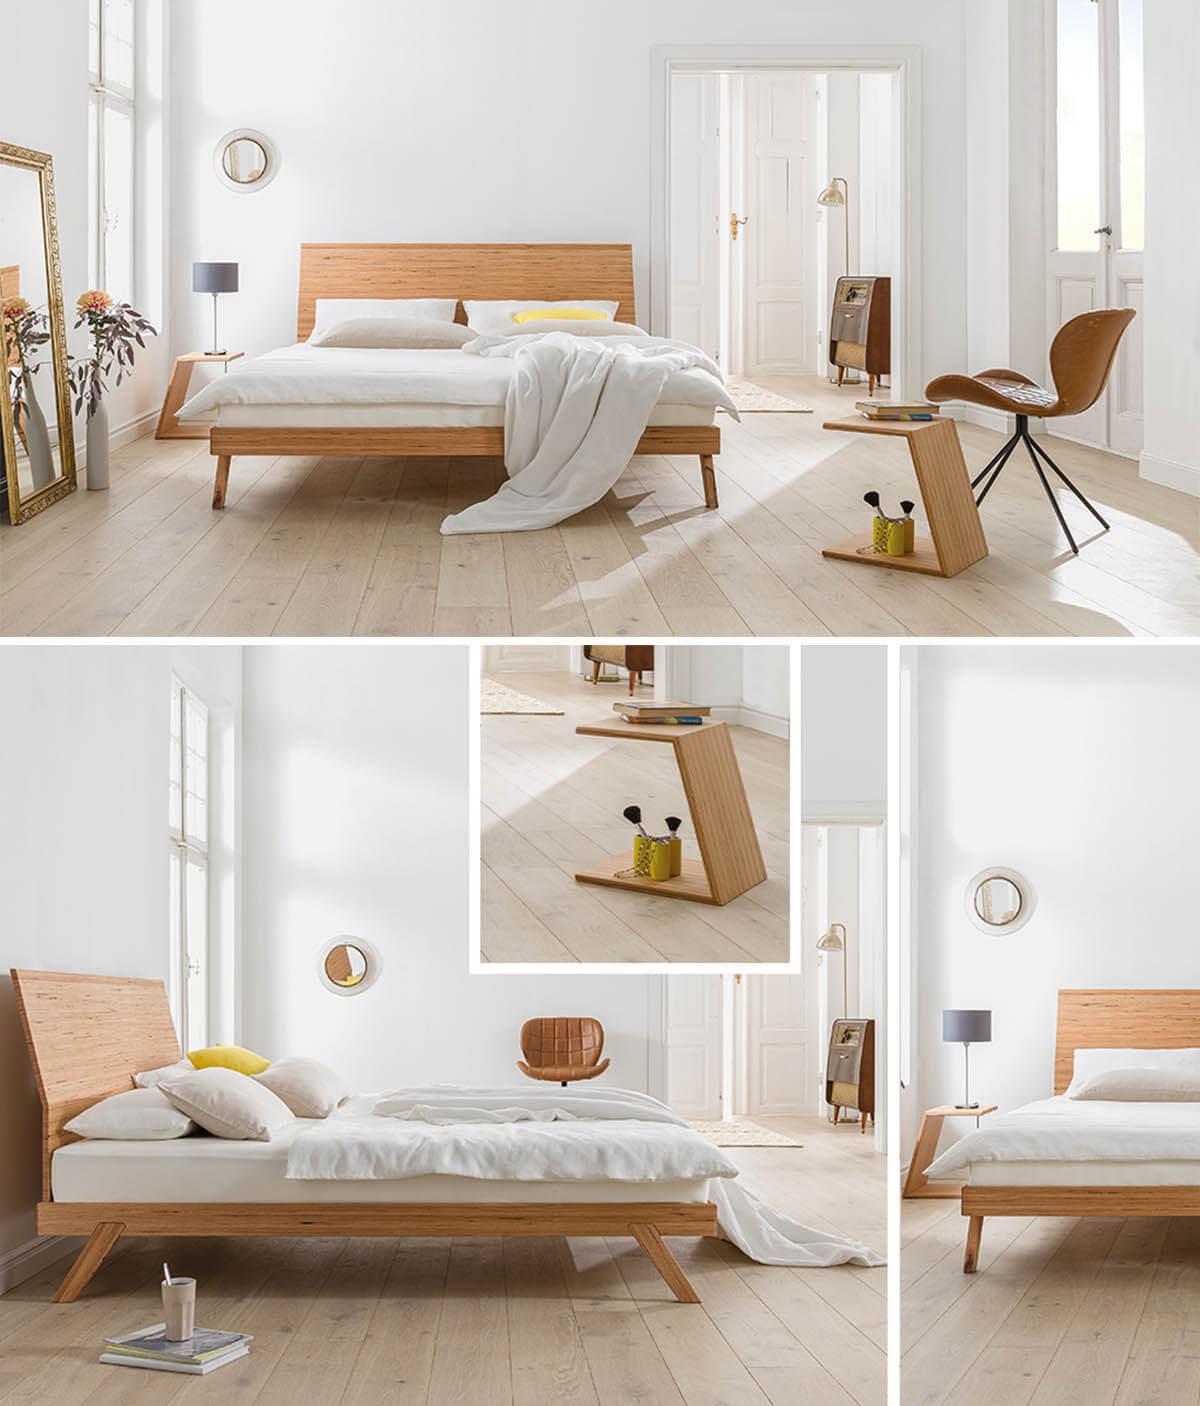 dormiente-Laria-Massivholzbett-Bett-aus-Massivholz-kaufen